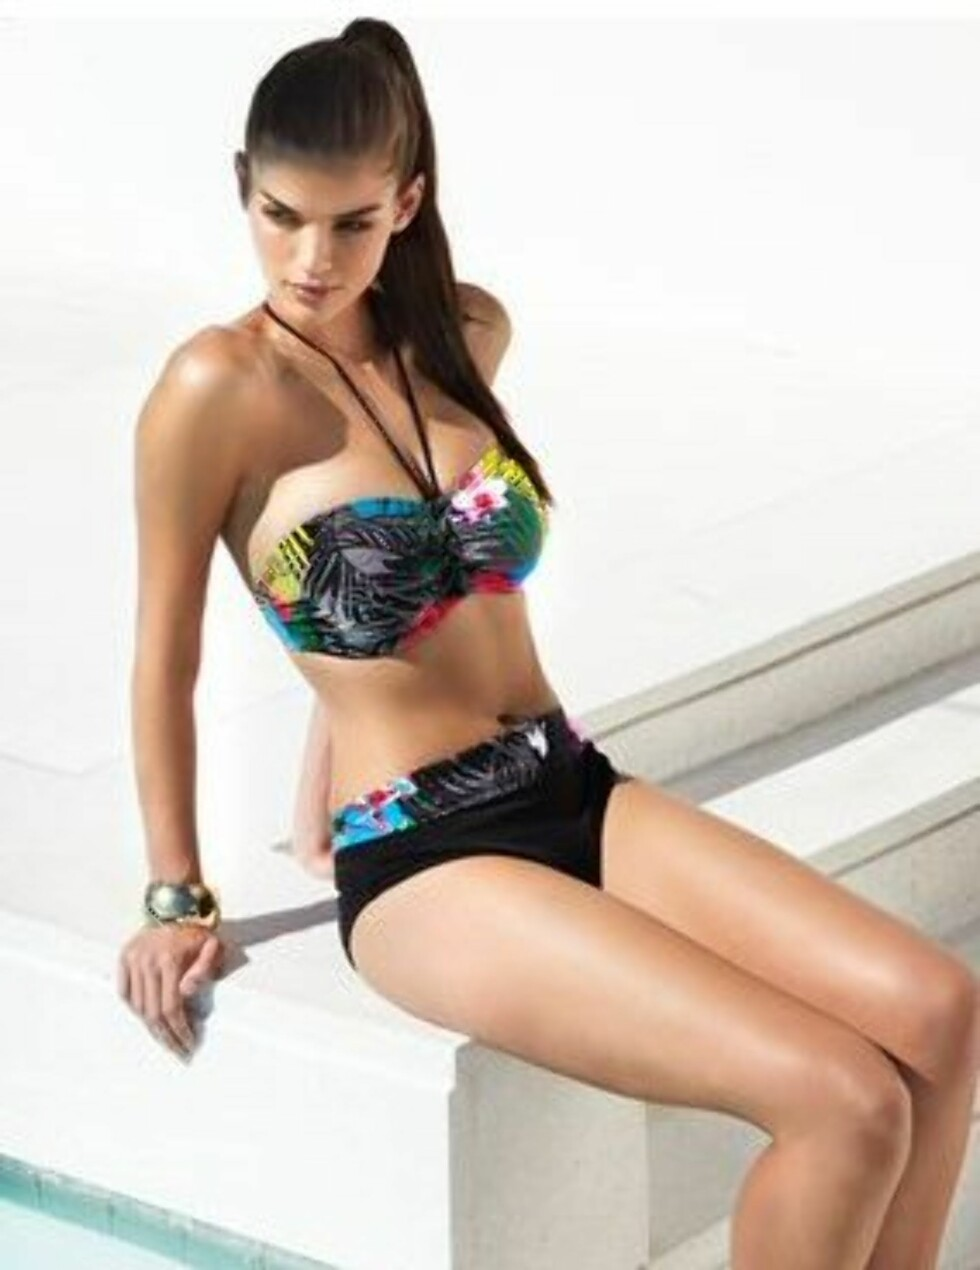 Bandeau-bikini fra Sophina til 50 pund hos Figleaves.co.uk. Foto: Produsentene